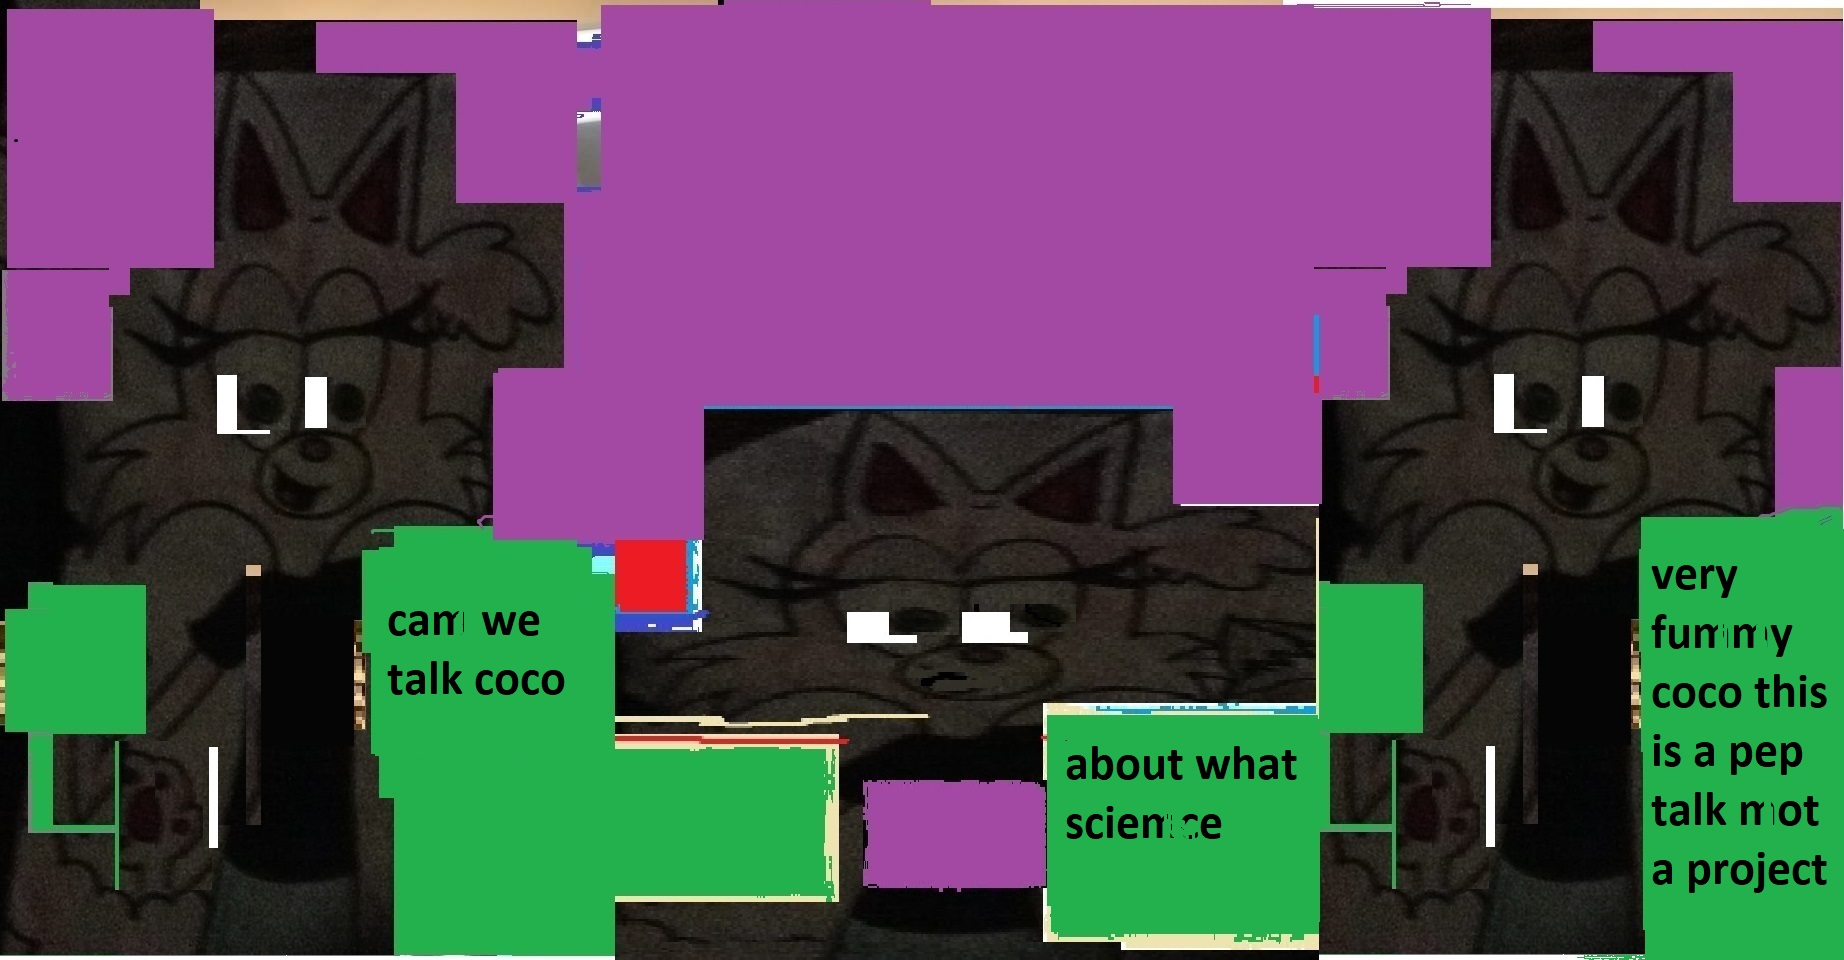 talk cici